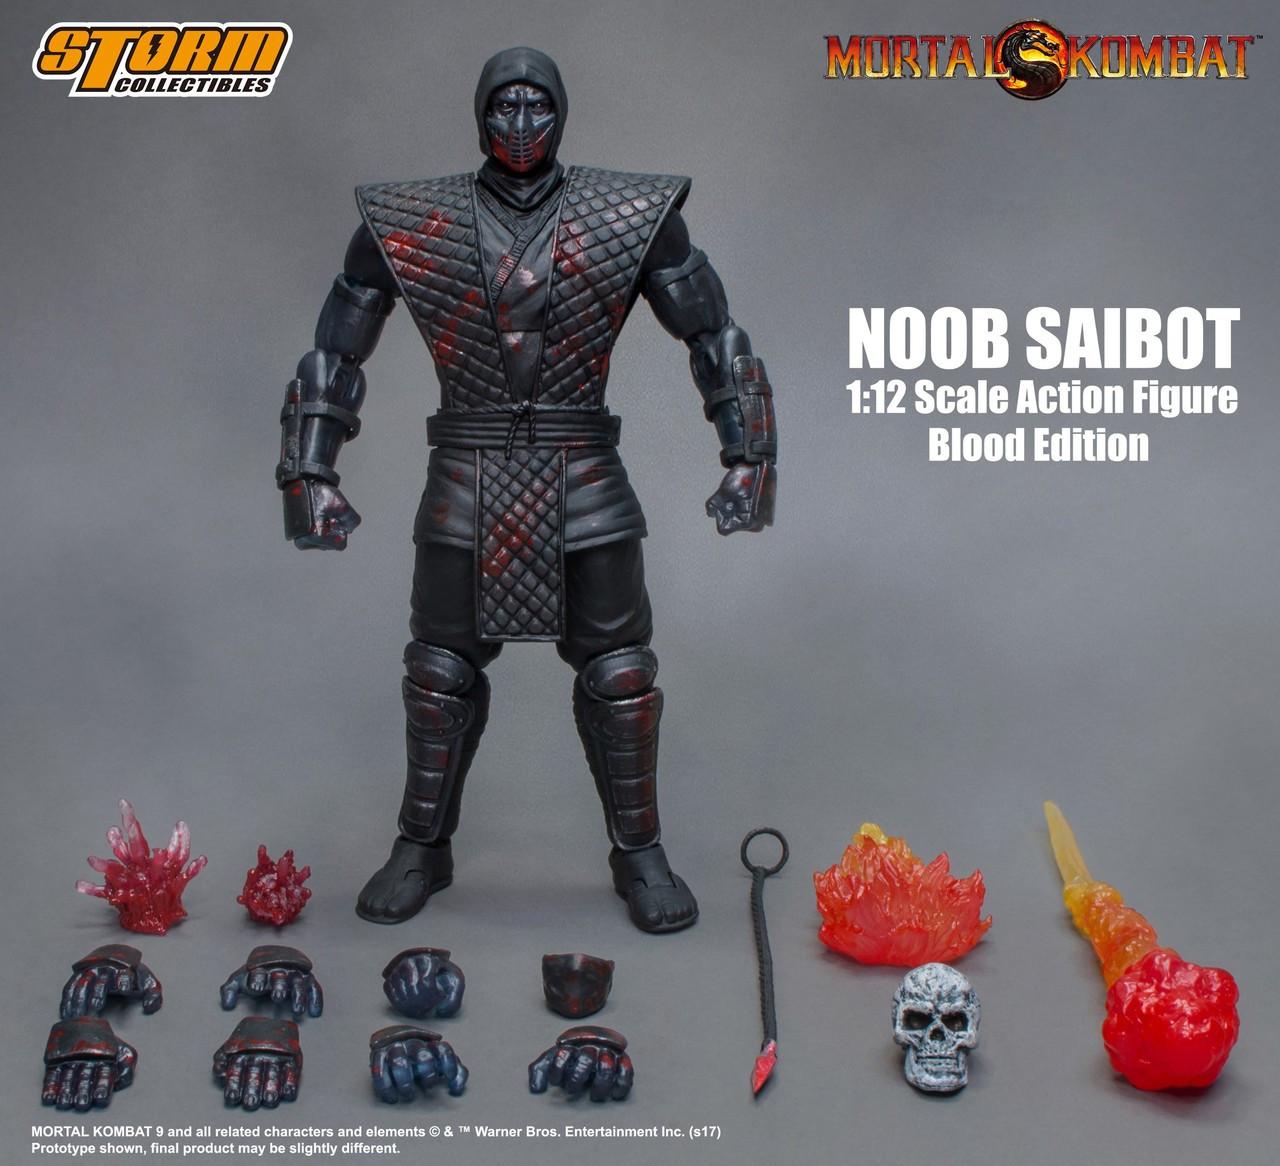 Mortal Kombat Noob Saibot Action Figure [Special Edition]